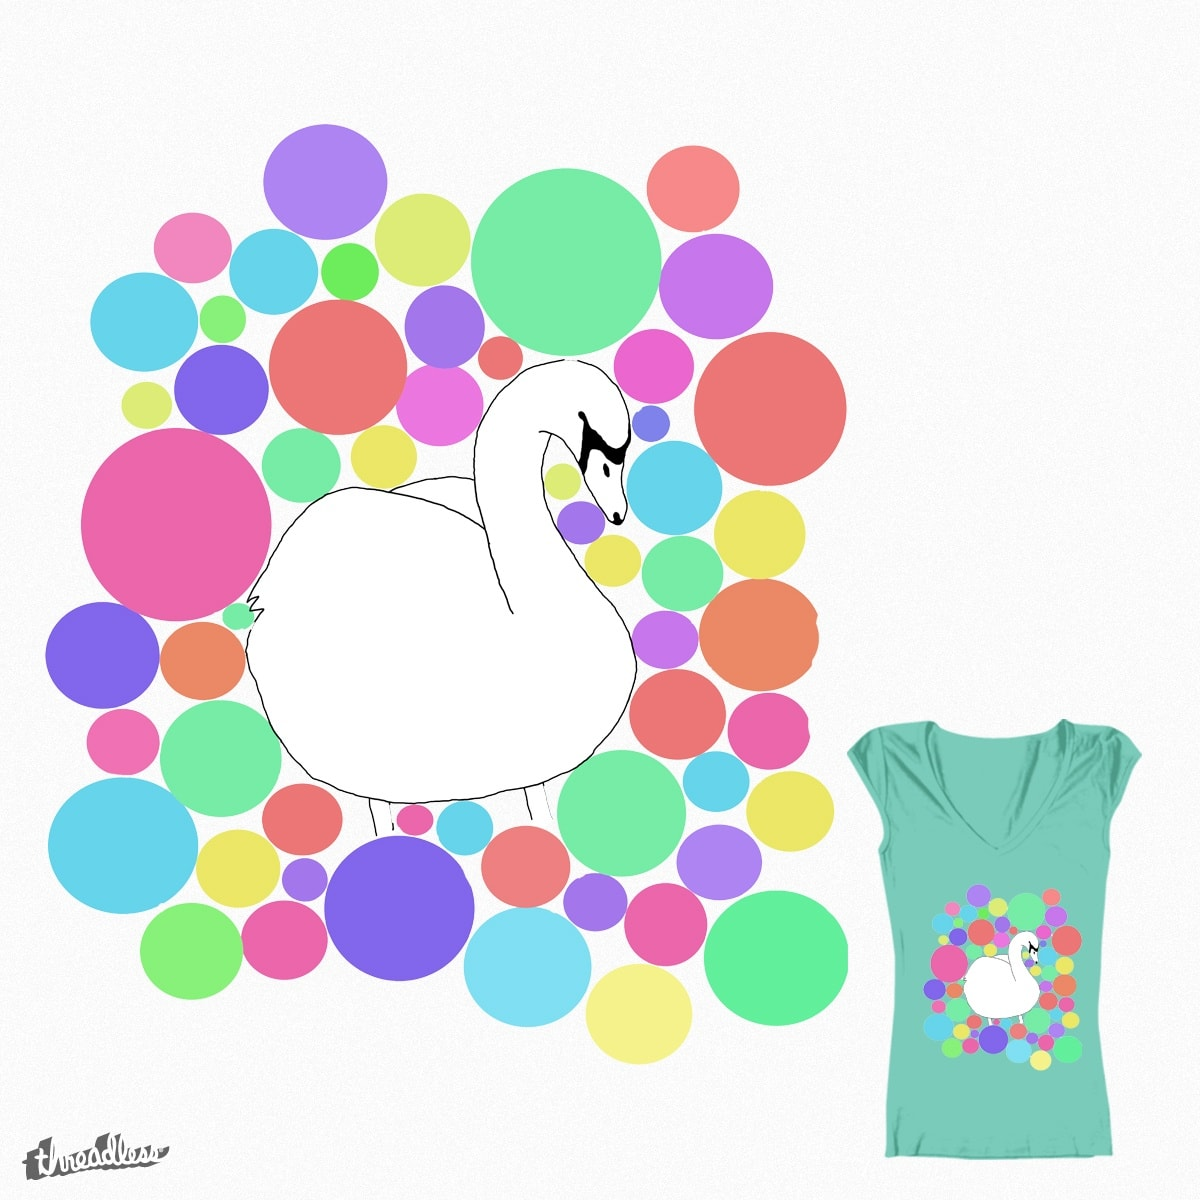 Spotty Swan by IzzyTonkin on Threadless